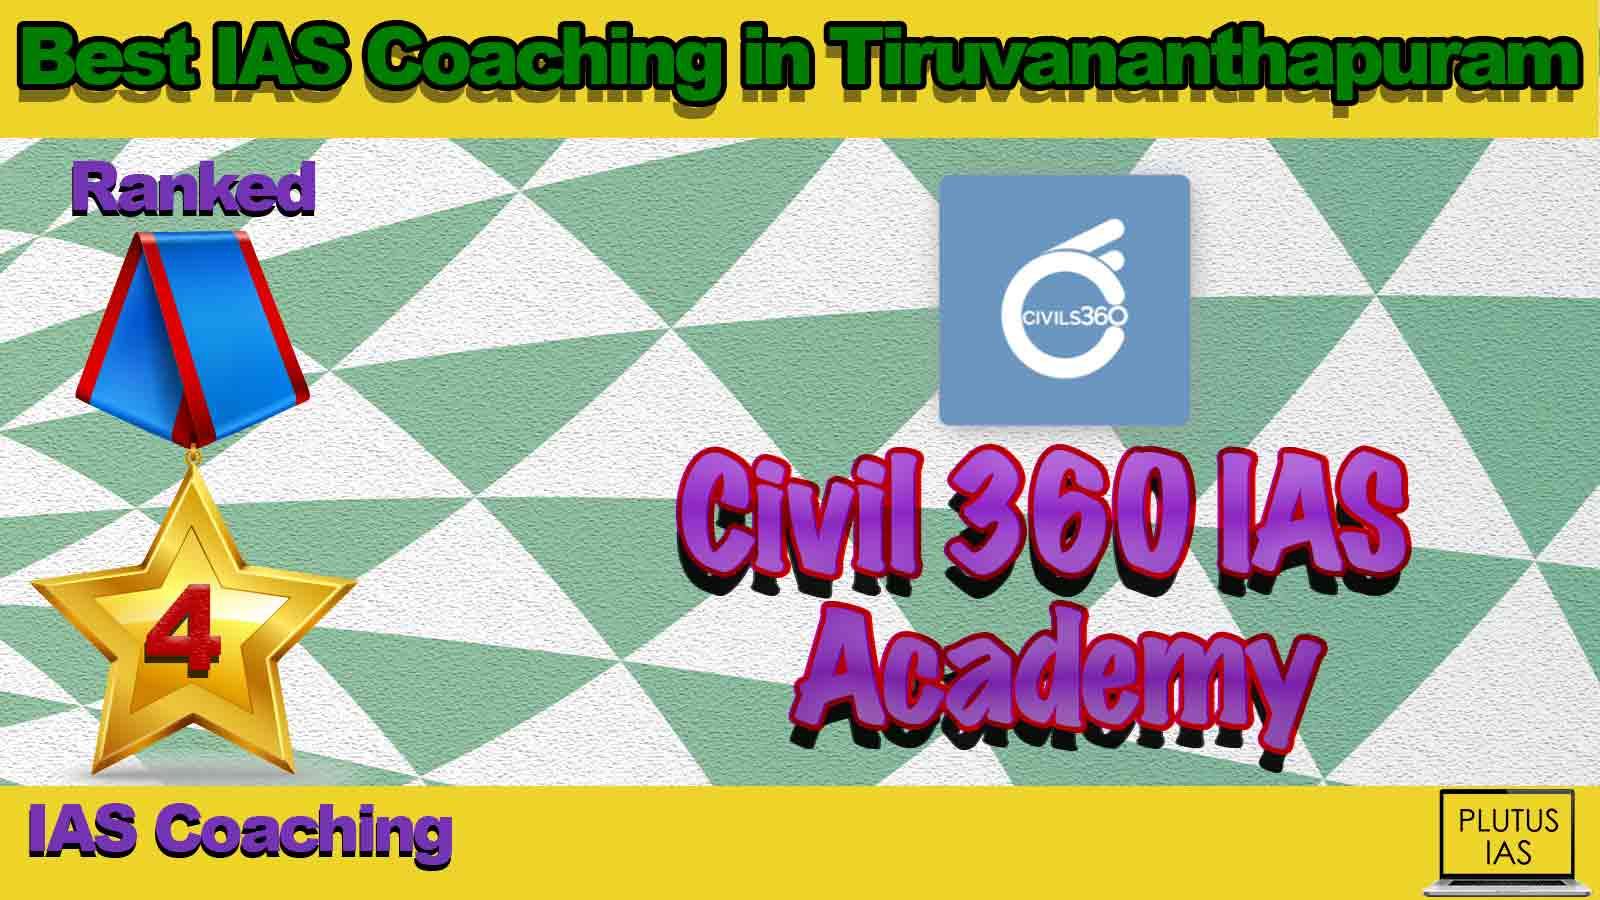 Best IAS Coaching in Tiruvananthapuram